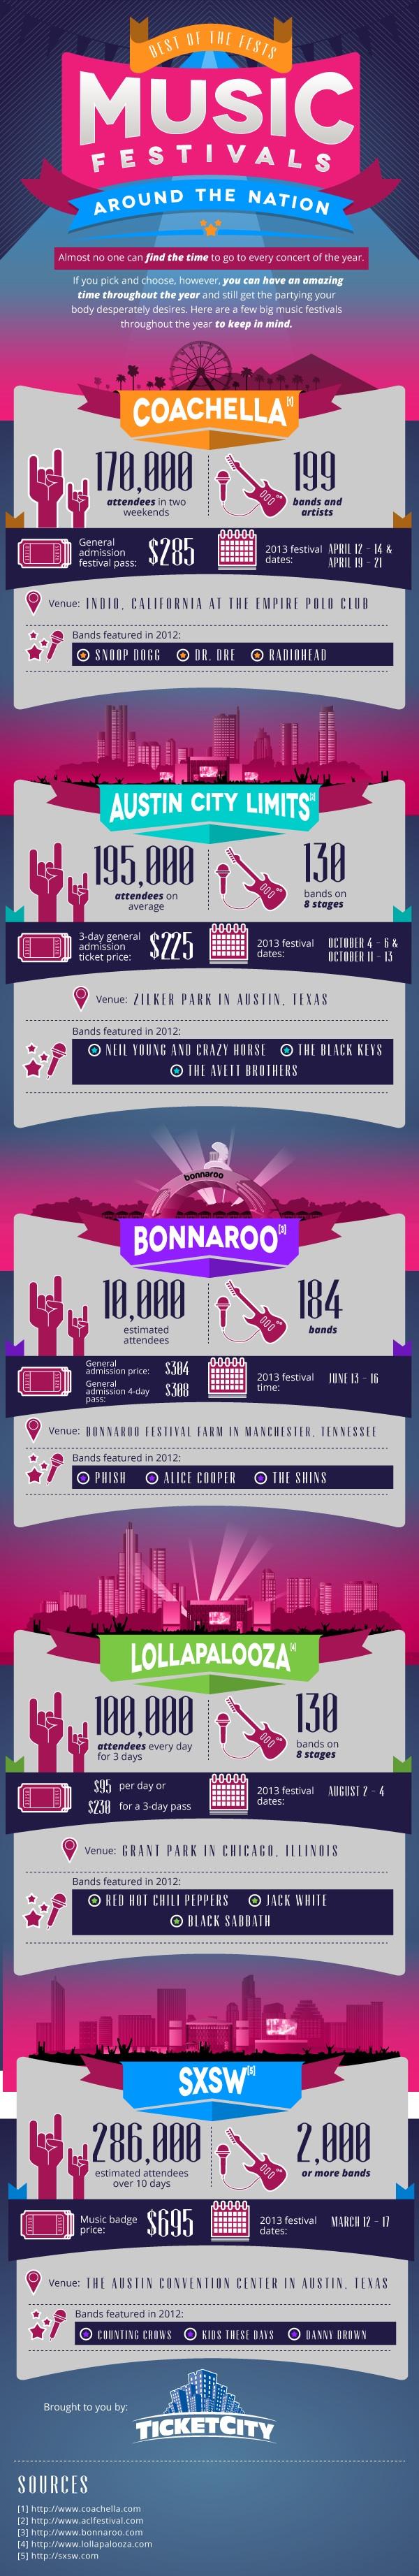 Best of the Music Festivals